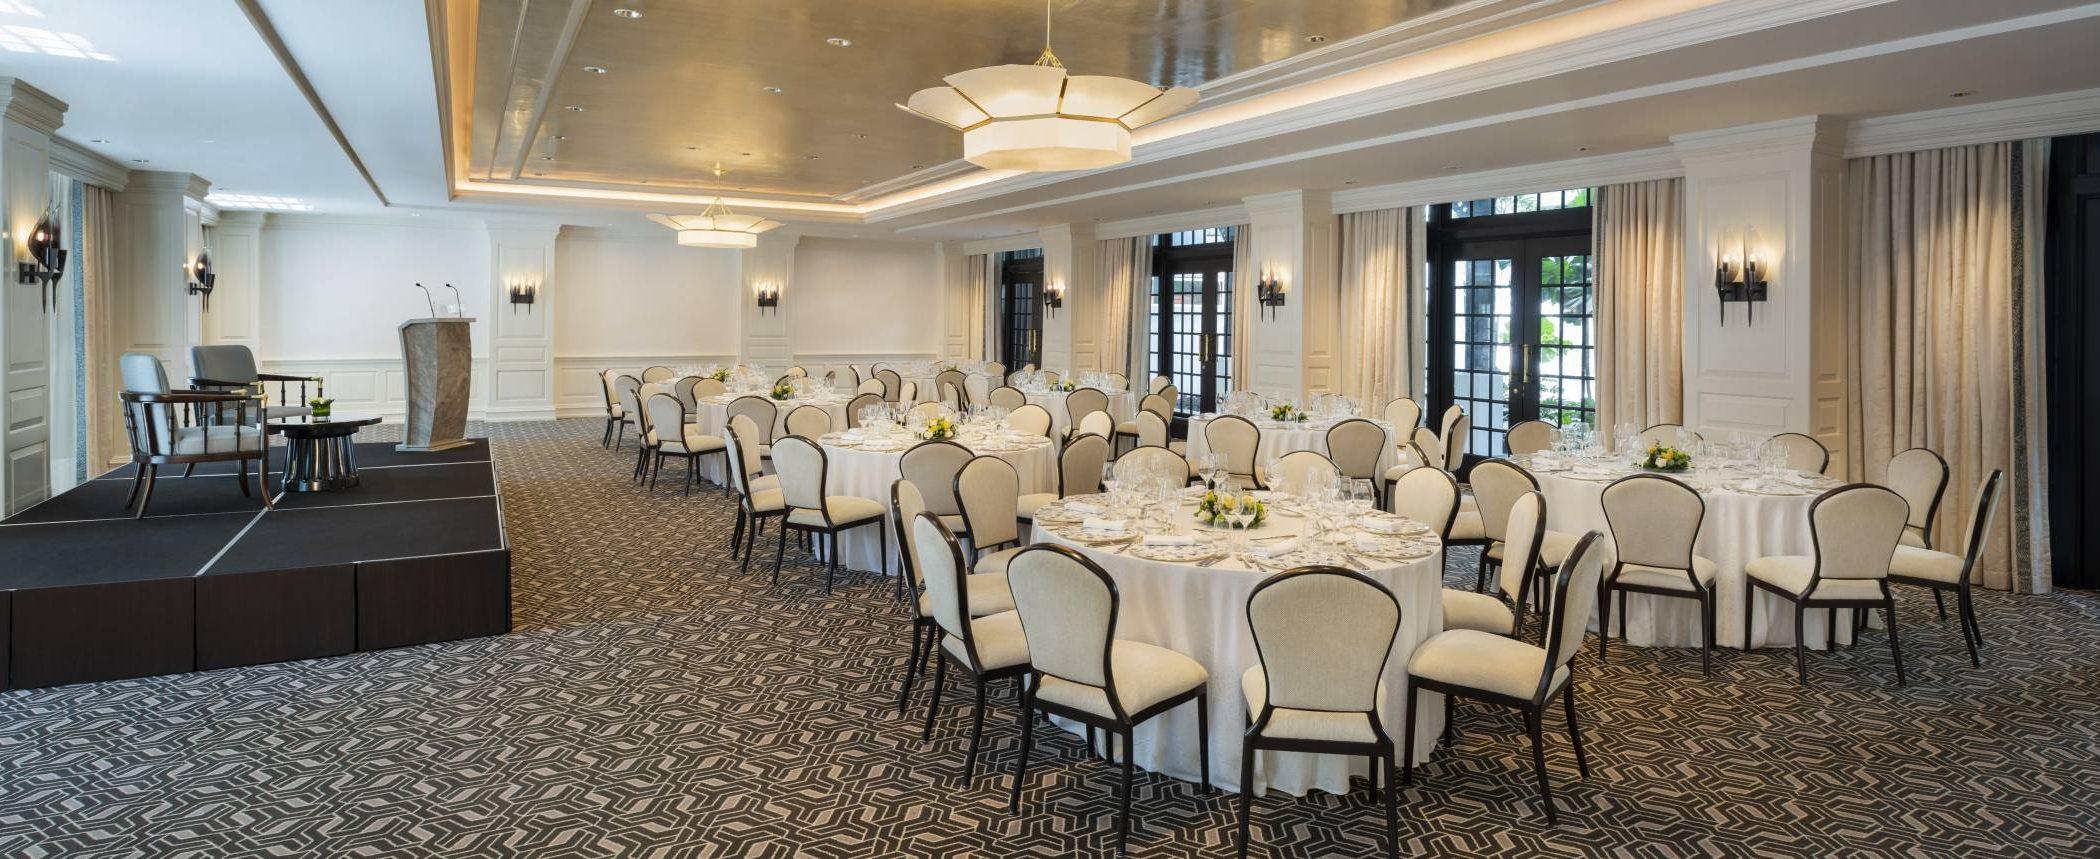 Raffles Singapore  - East India Room